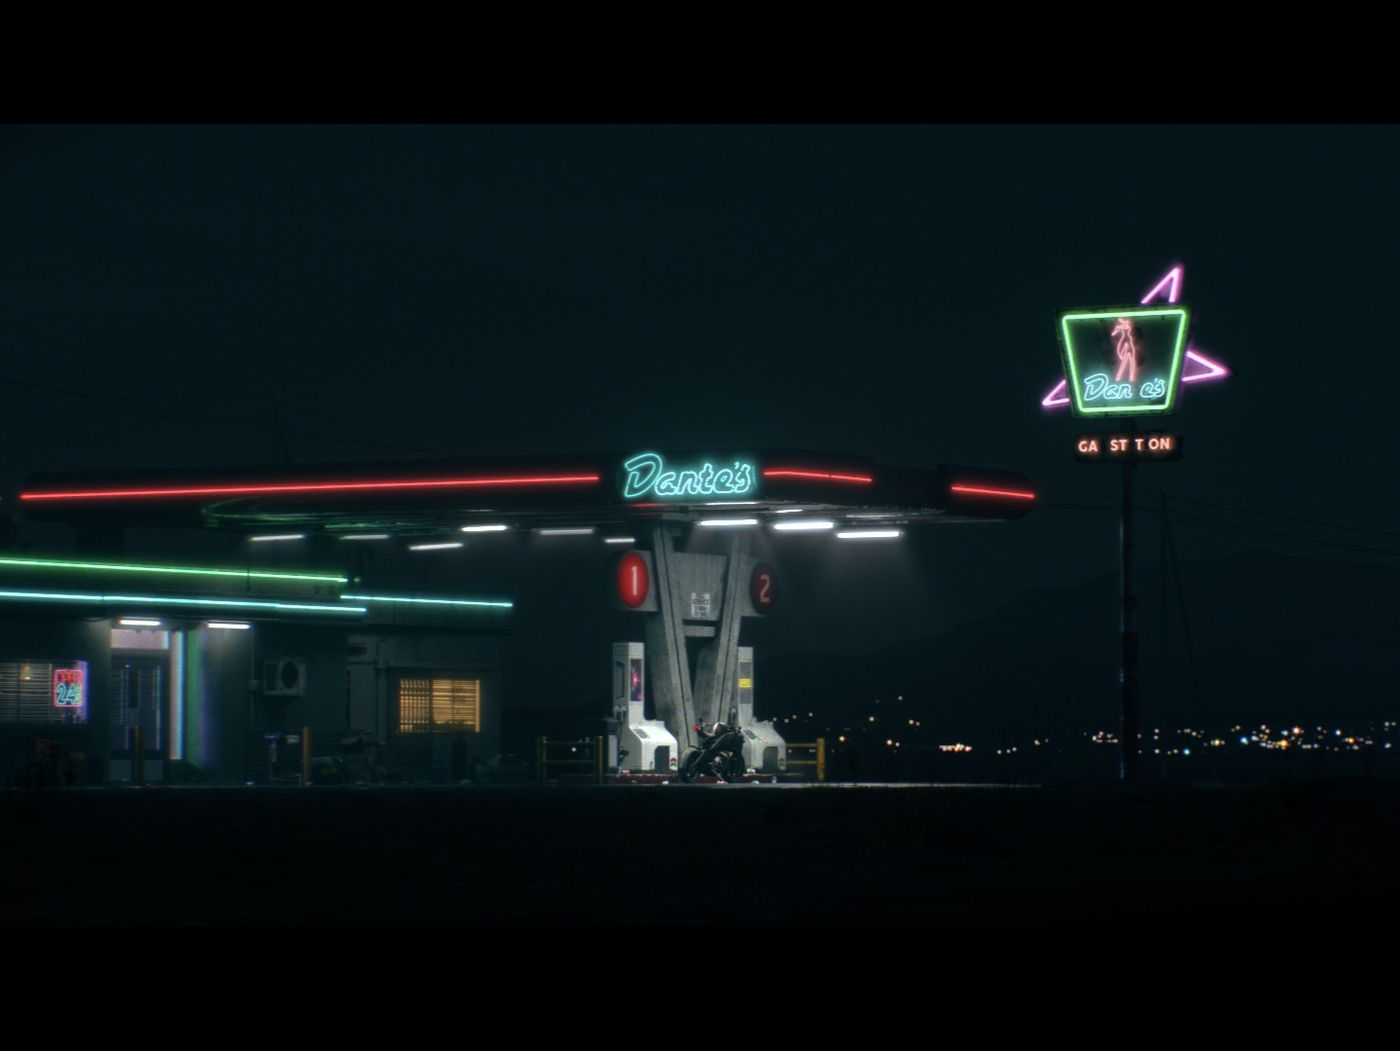 Dante's Gas Station